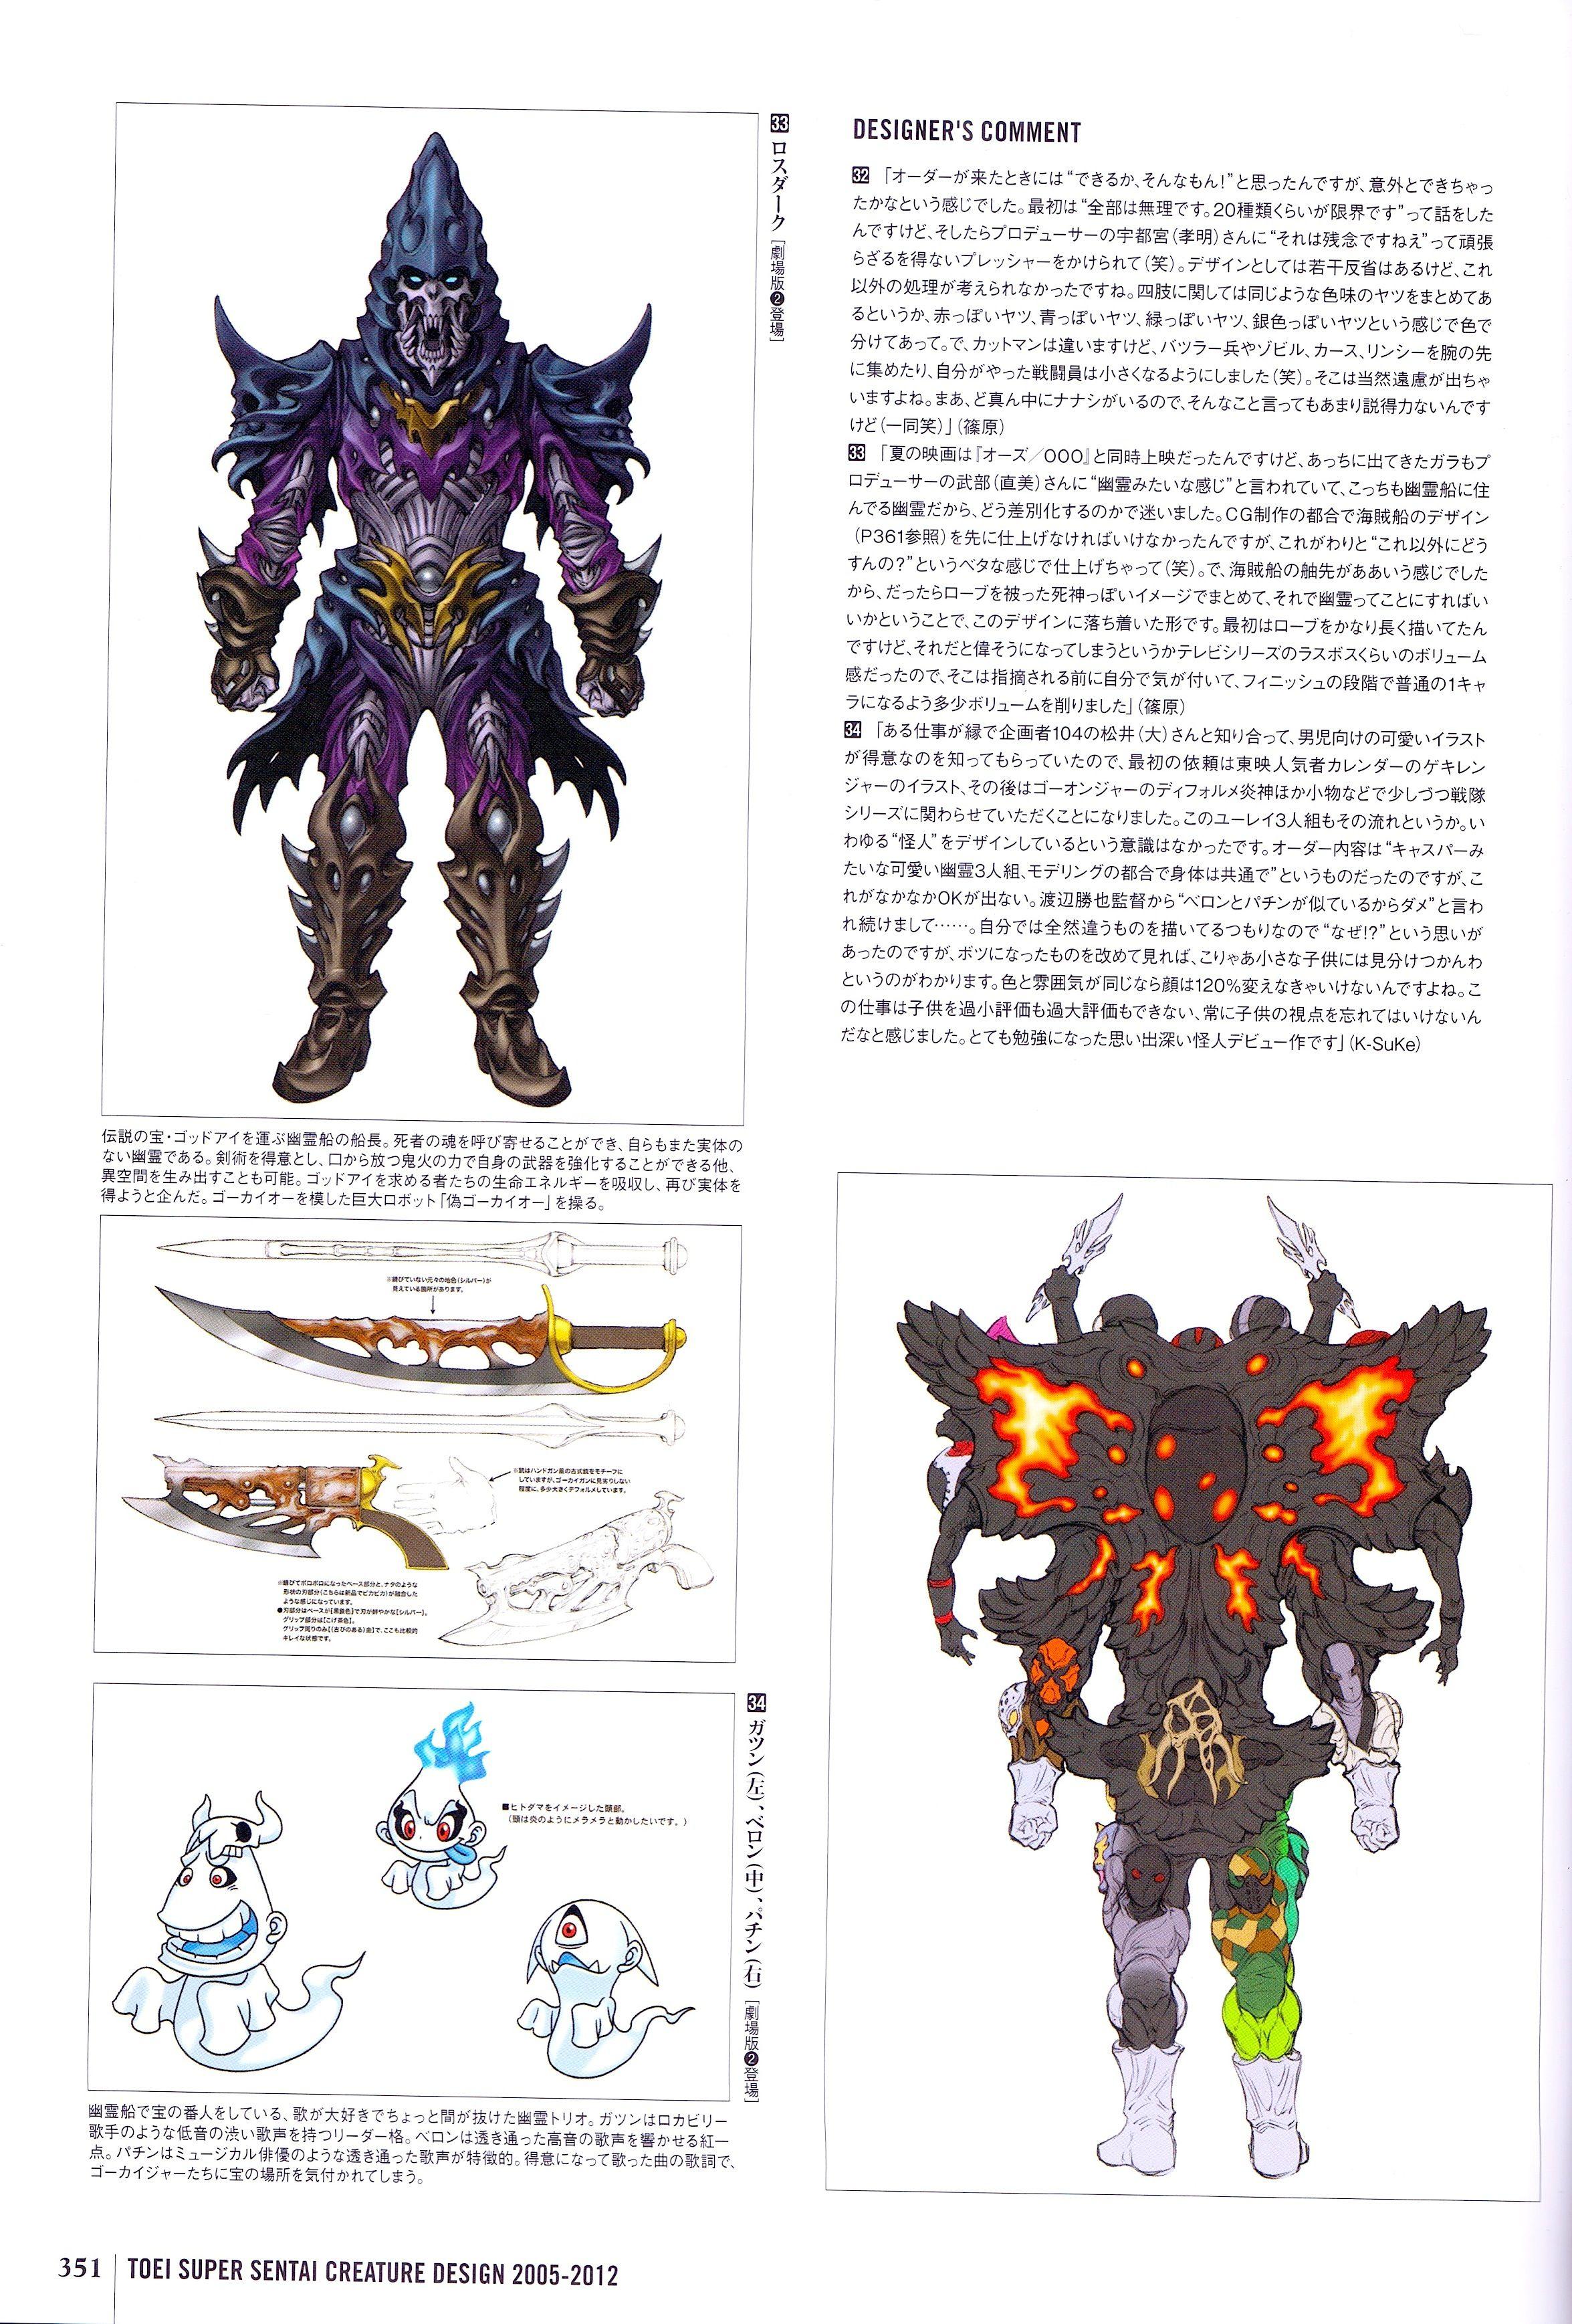 Kaiju History 2011 Gokaiger Character Design Creature Art